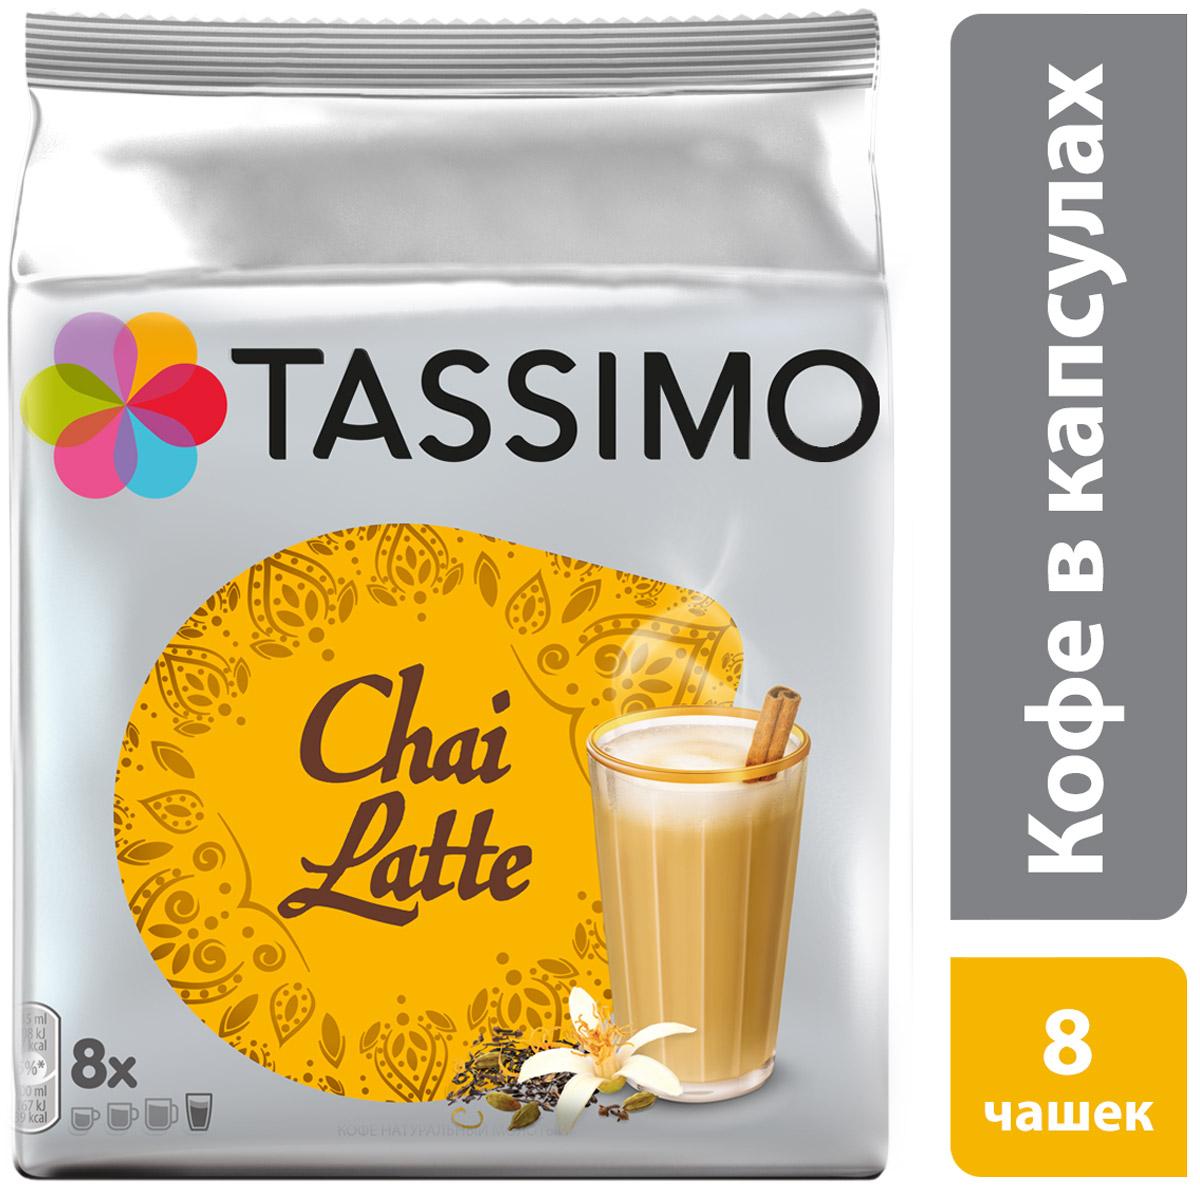 Tassimo Twinings Chai Latte чай с пряностями в капсулах, 8 шт tassimo акция